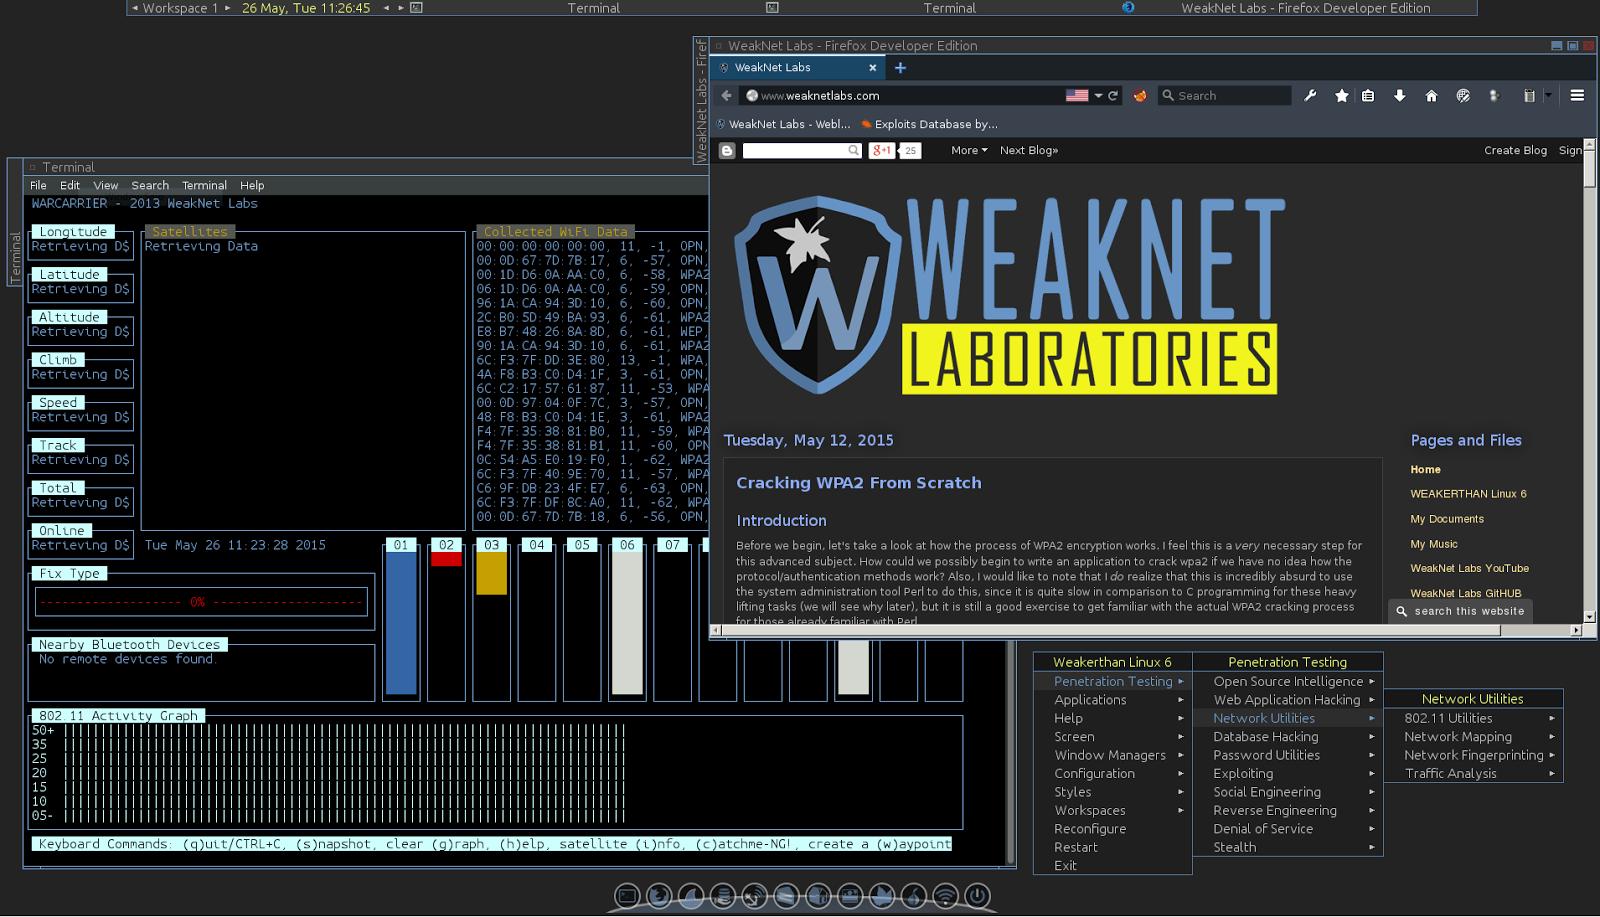 WeakNet Labs: WEAKERTHAN Linux 6 BETA 2 Release